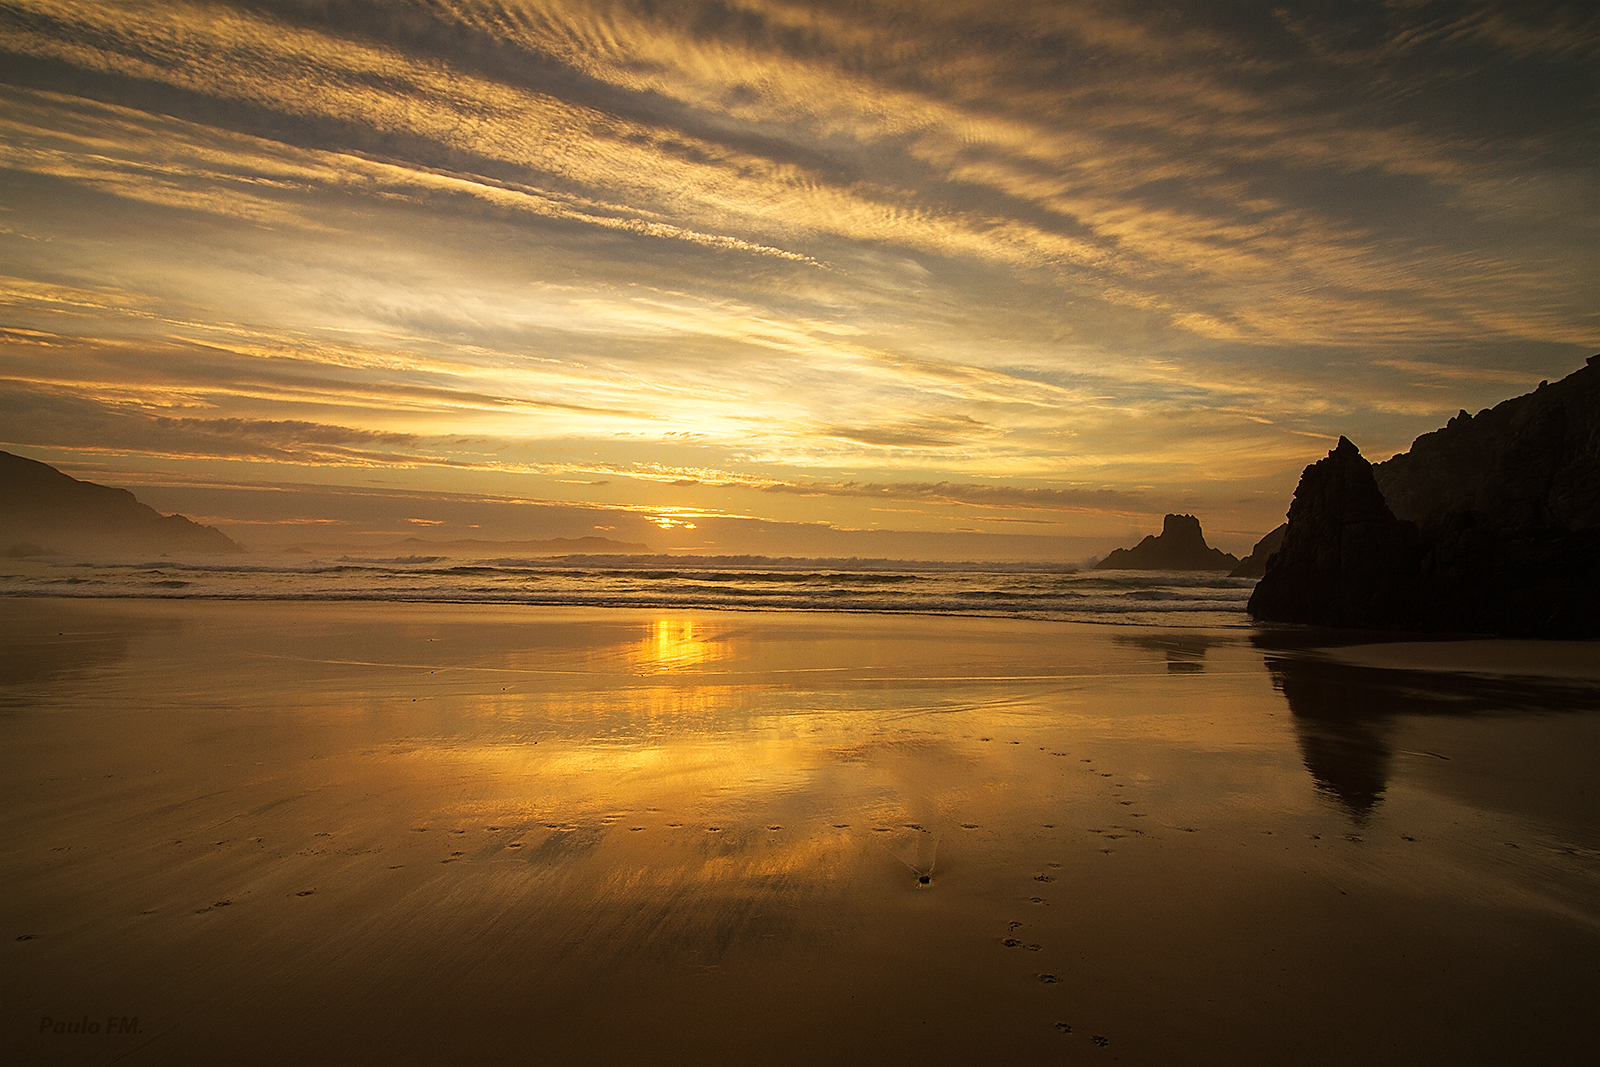 3643 - Campelo's beach - Valdoviño